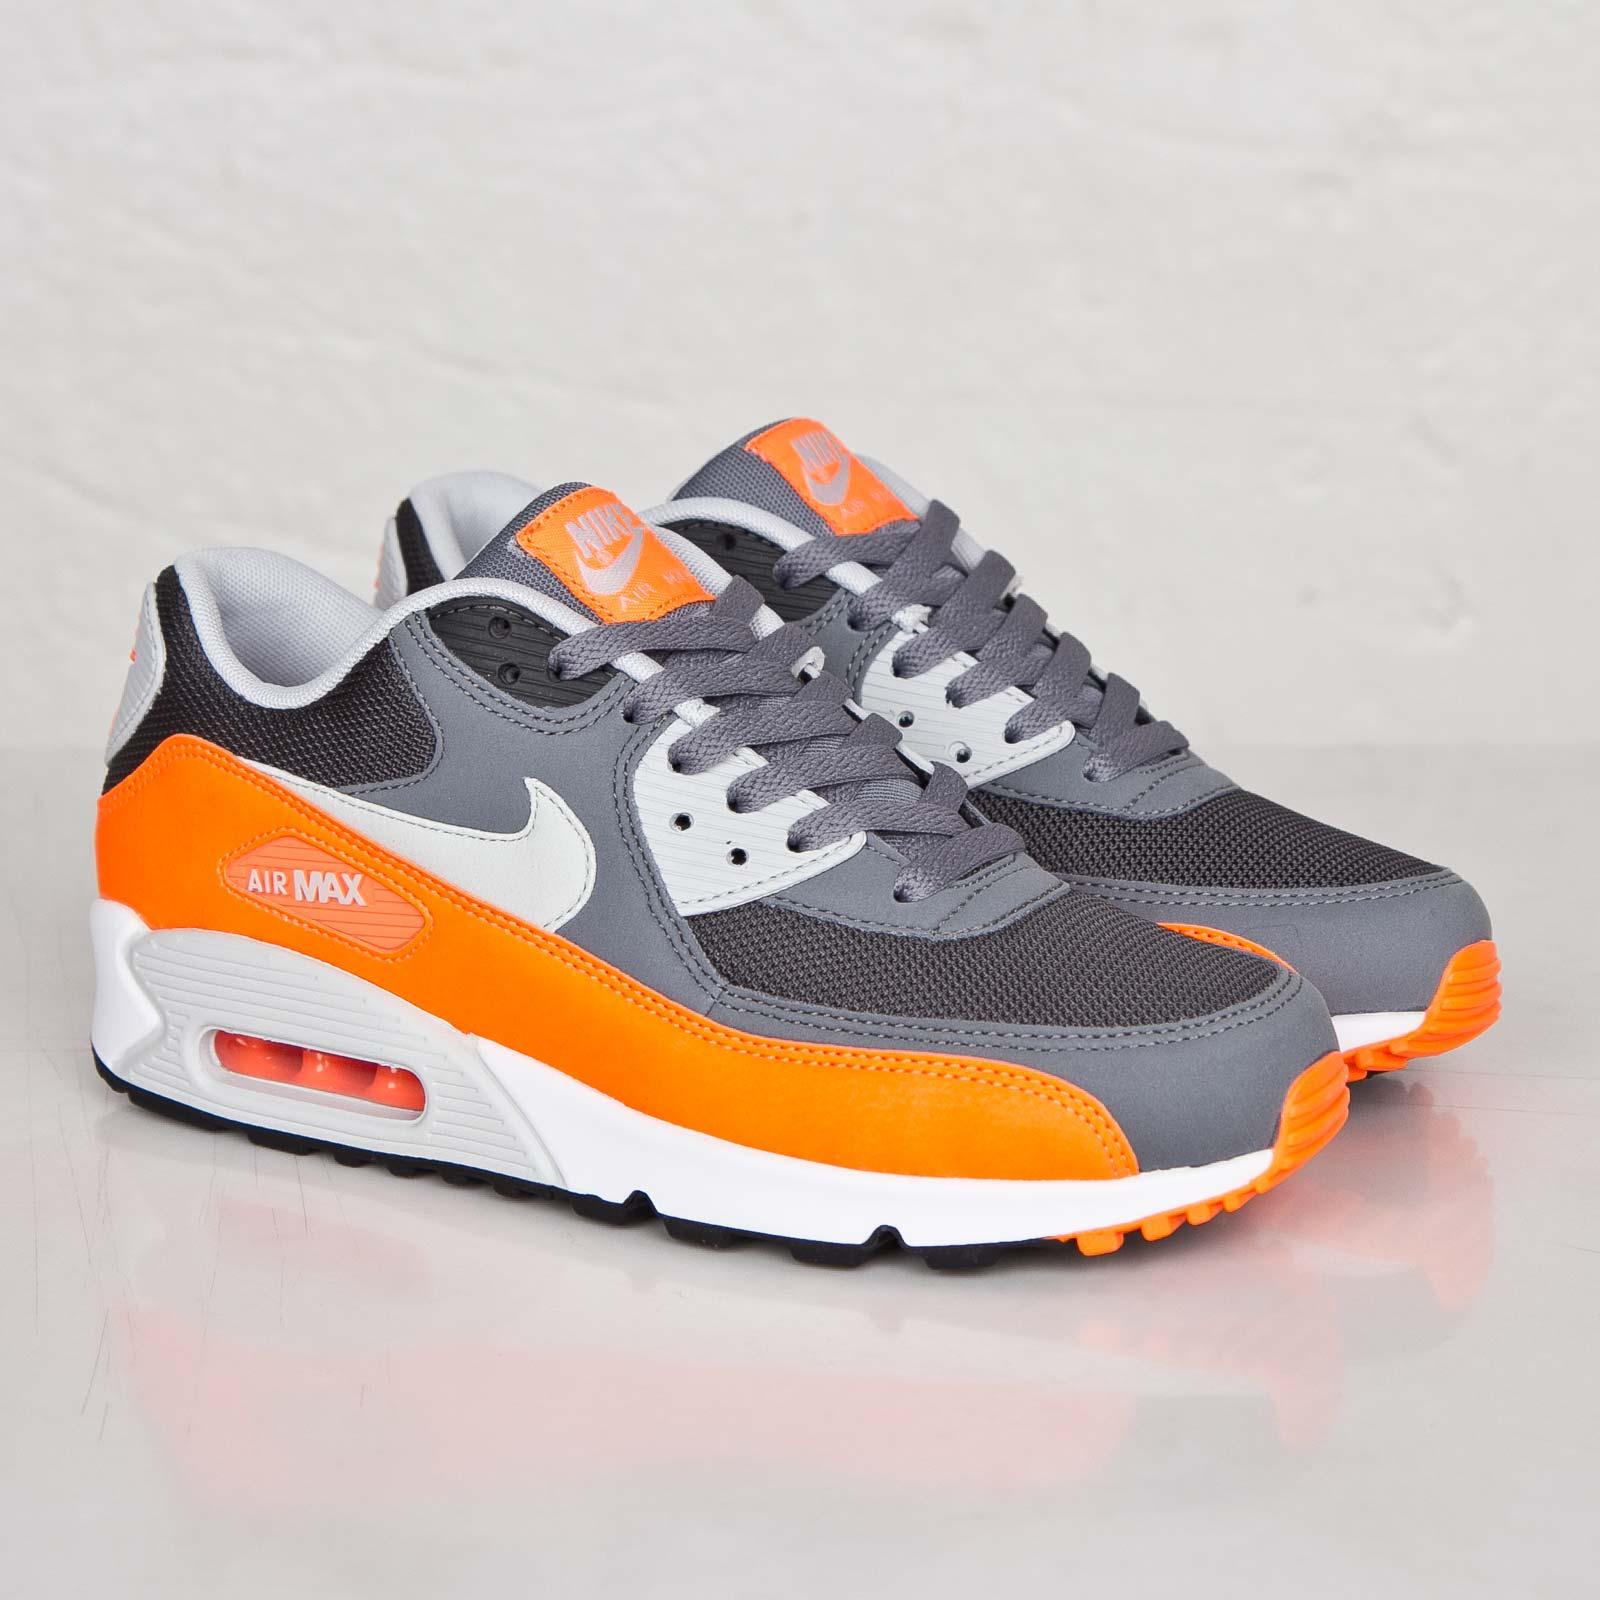 Nike Air Max 90 Essential Schuhe cool grey-pure platinum-total orange-anthracite - 42 TGHJ9